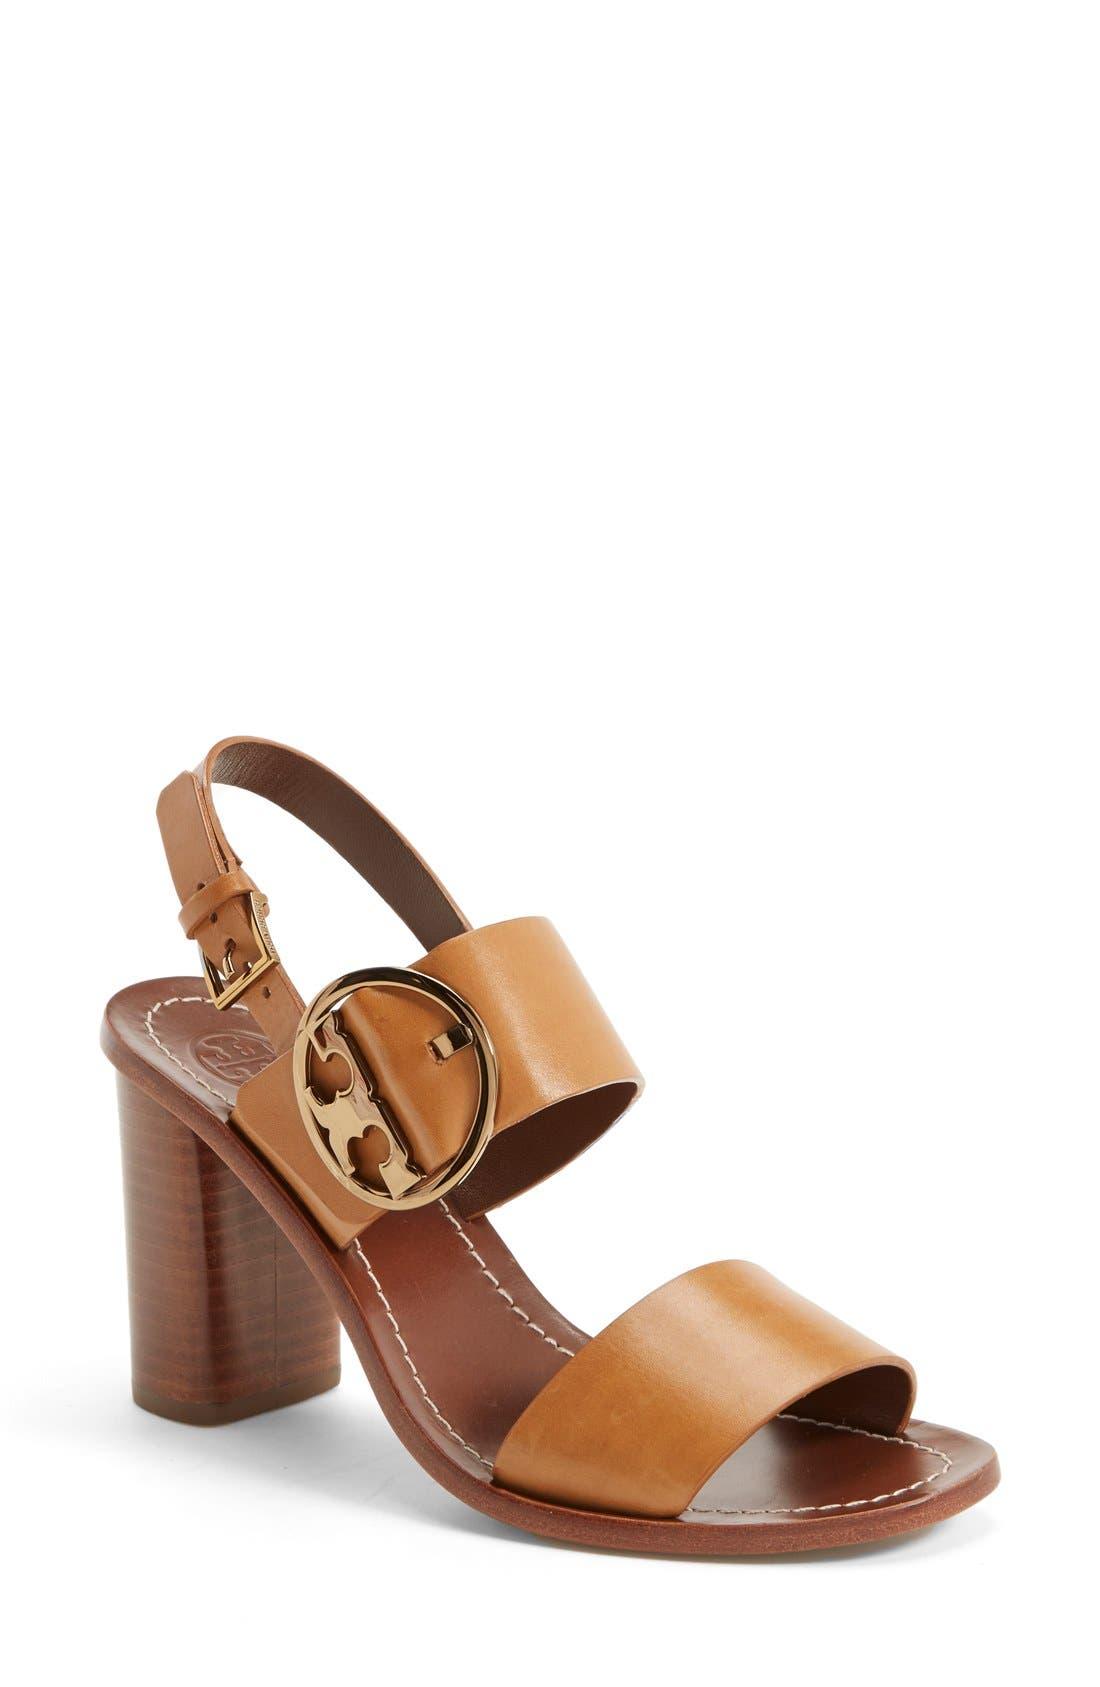 Alternate Image 1 Selected - Tory Burch 'Thames' Sandal (Women)